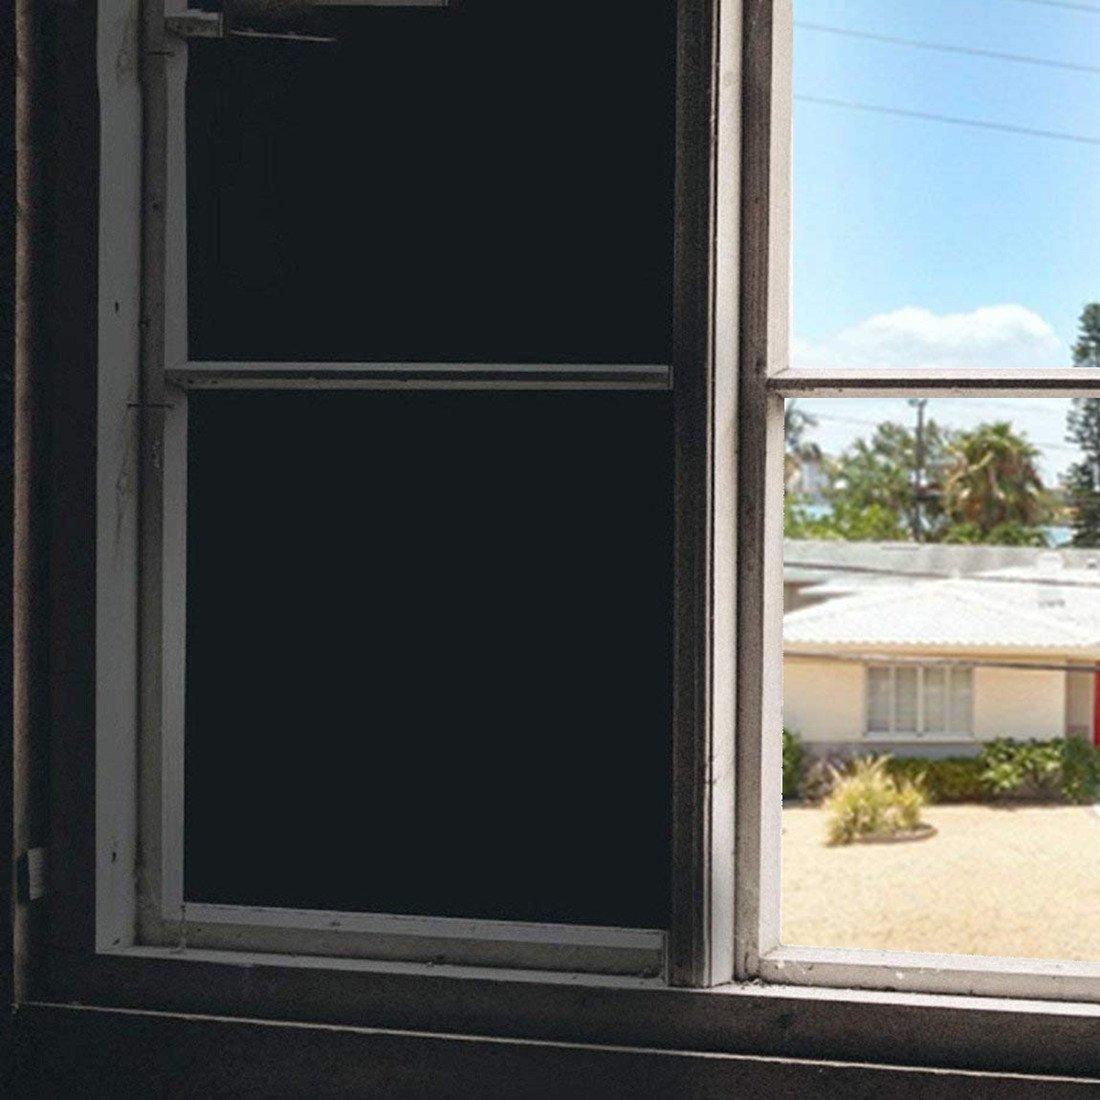 17.7 X 78.7 Inch, Black UV Control Room Darkening Window Treatment for Kids Room//Day Sleeper Soqool Sun Blocking Window Covering Film 100/% Light Blocking Window Blackout Film Privacy Window Film